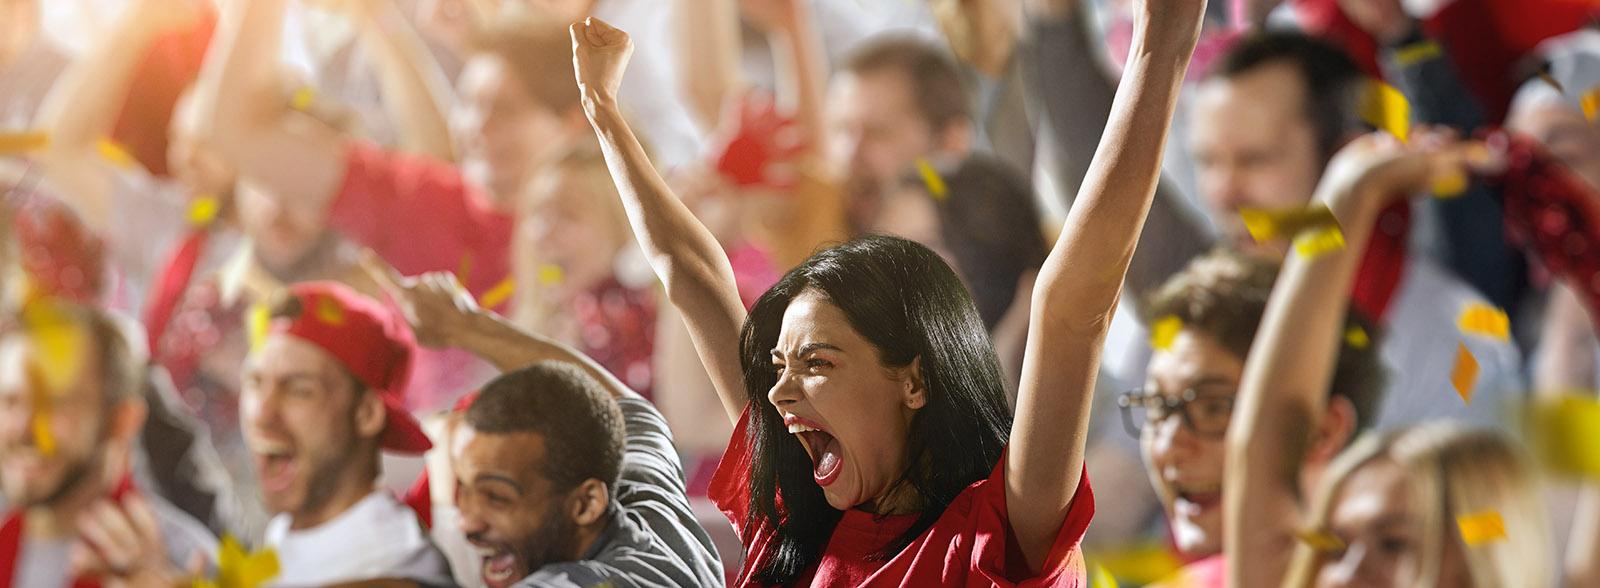 Sport fans: A girl shouting